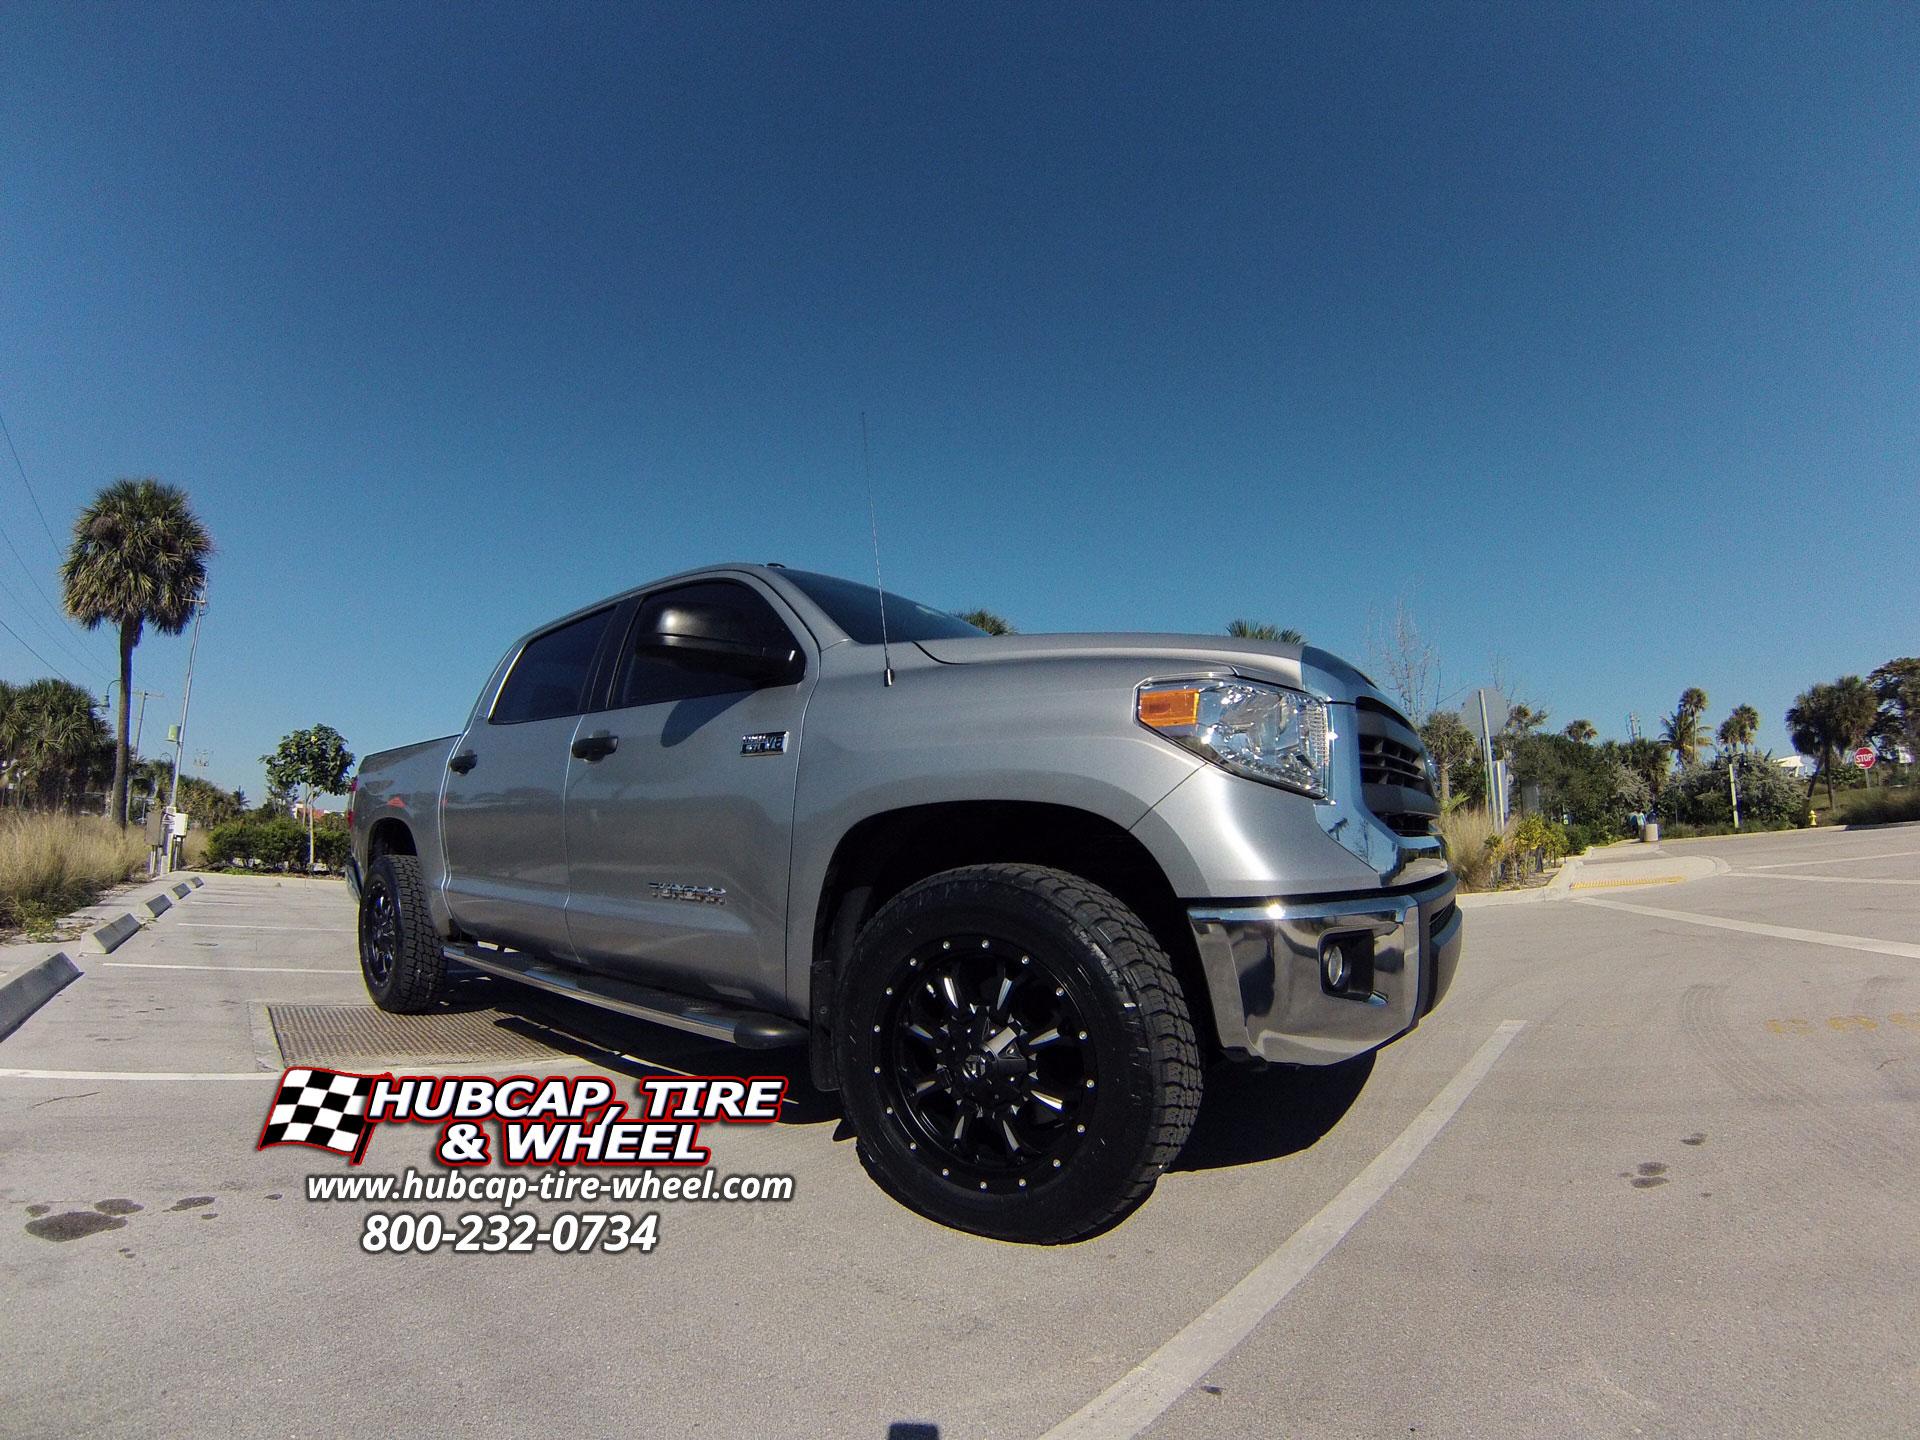 2014 Toyota Tundra with 20″ Fuel Krank D517 Wheels